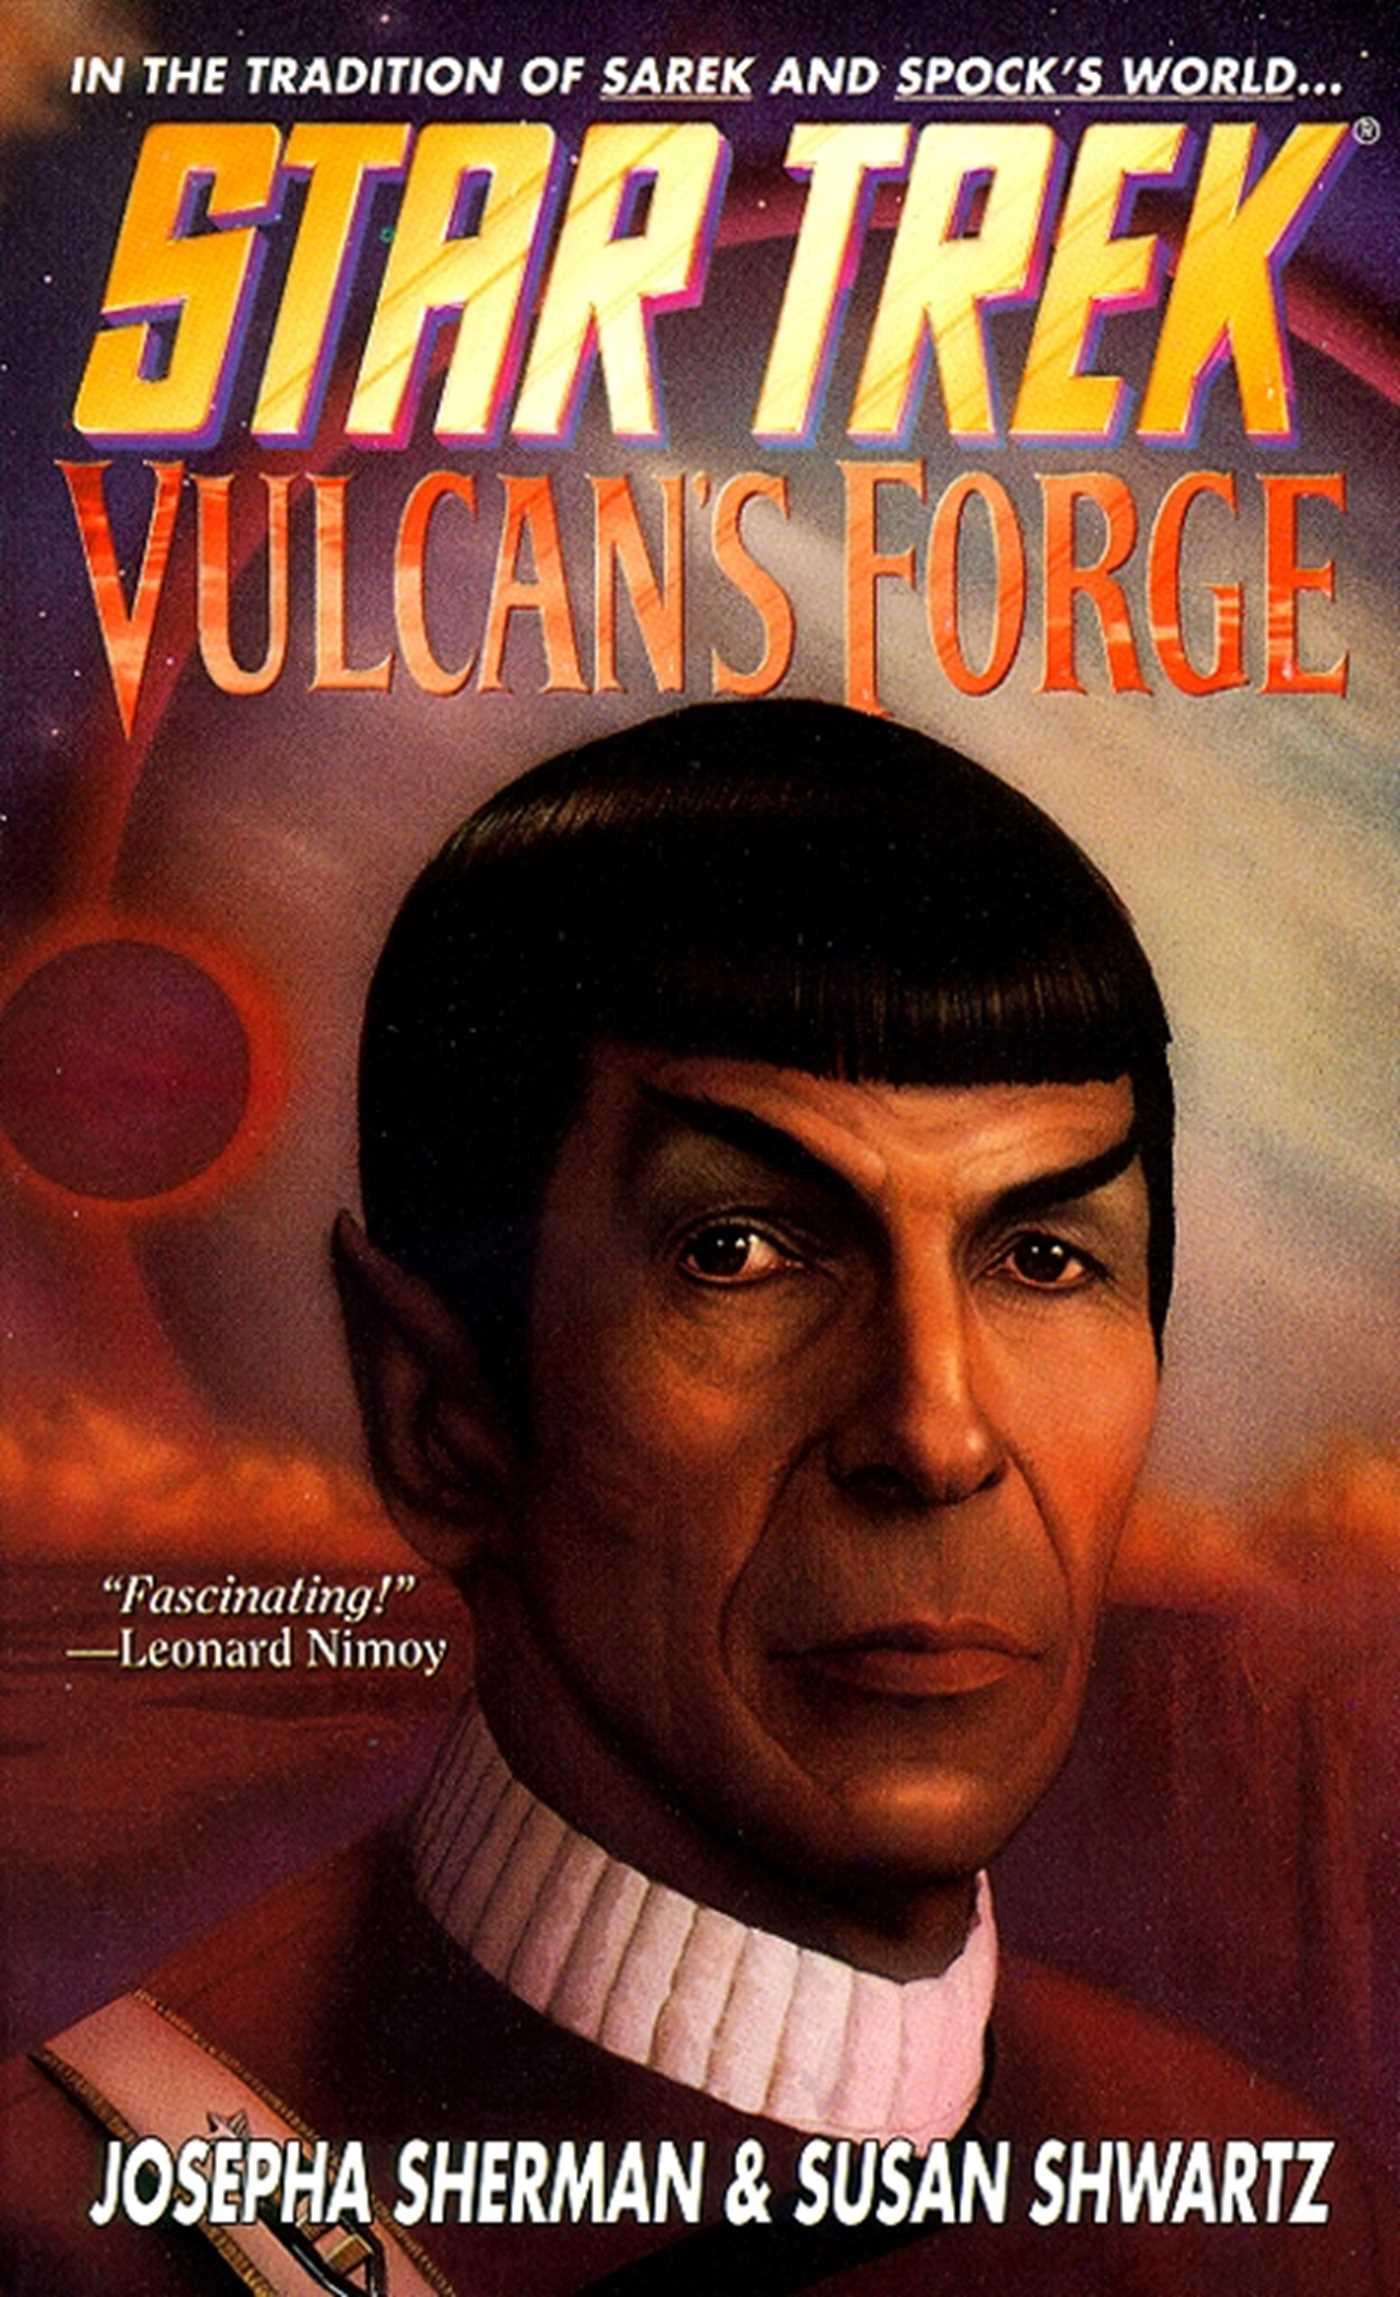 Star trek the original series vulcans forge 9780743454063 hr